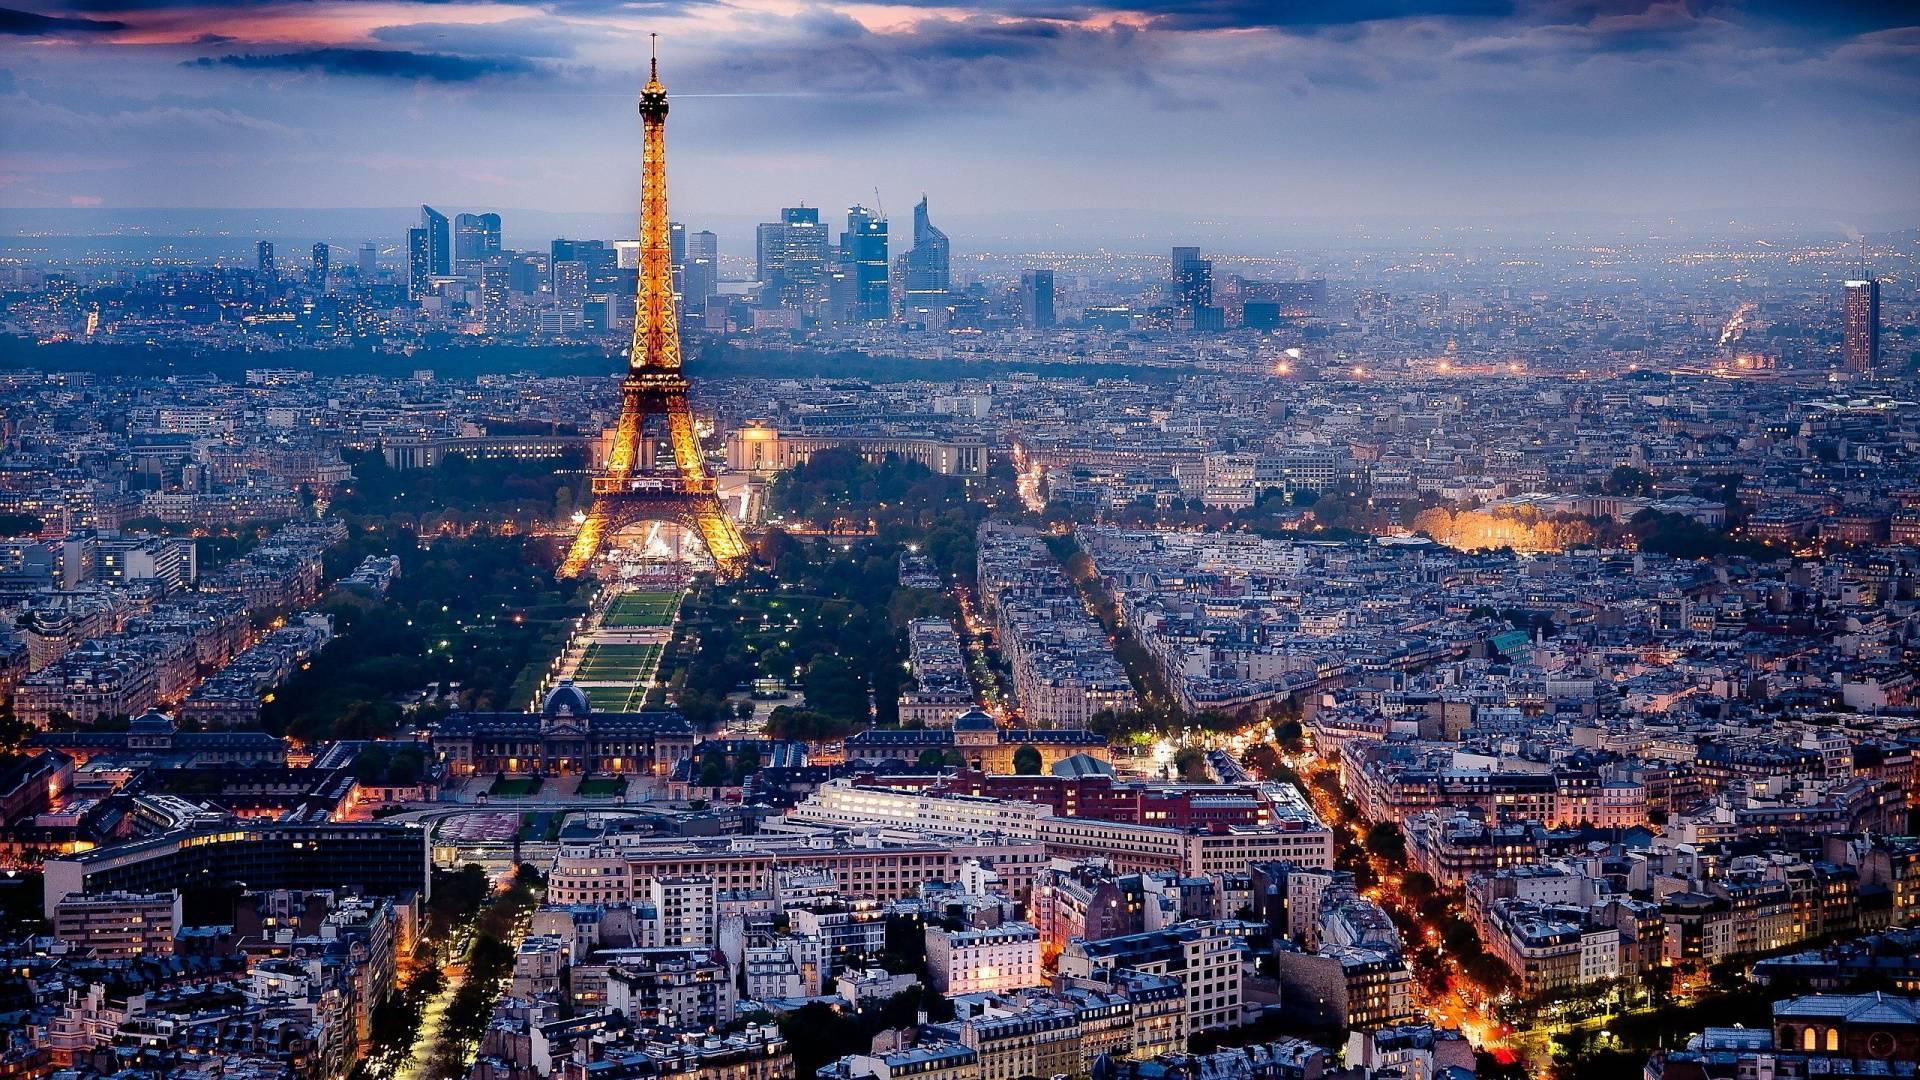 Paris City Of Love Quotes Wallpaper Desktop   SmaData.com